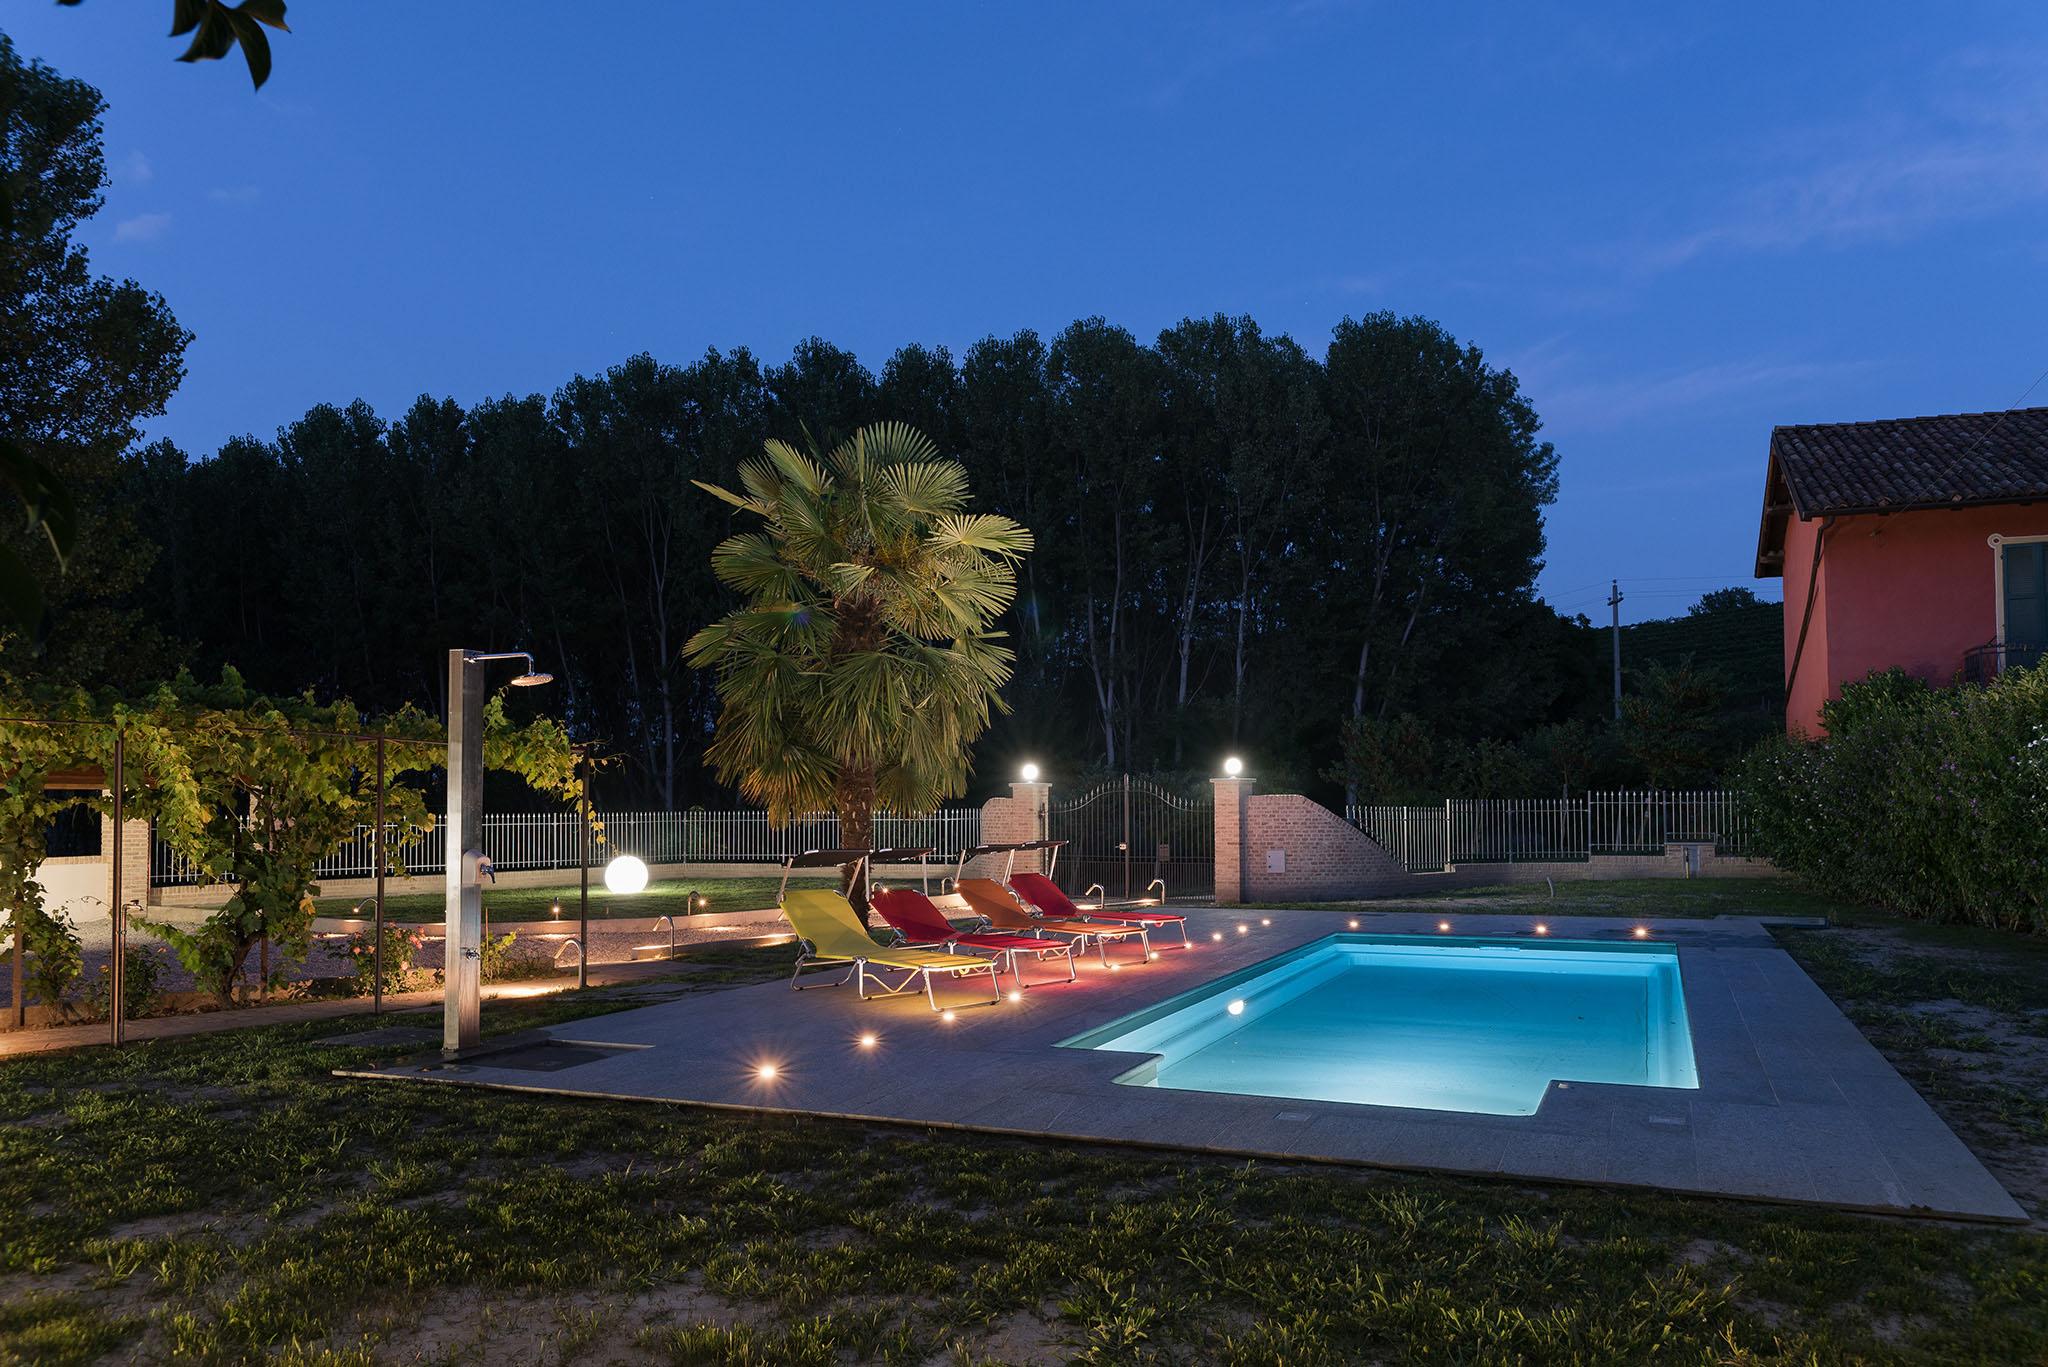 Architettura-Interni - Interior Photography Fotografo di interni Emanuele Tibaldi 7 - Fotografo-di-architettura-piscina - Fotografo-di-architettura-piscina